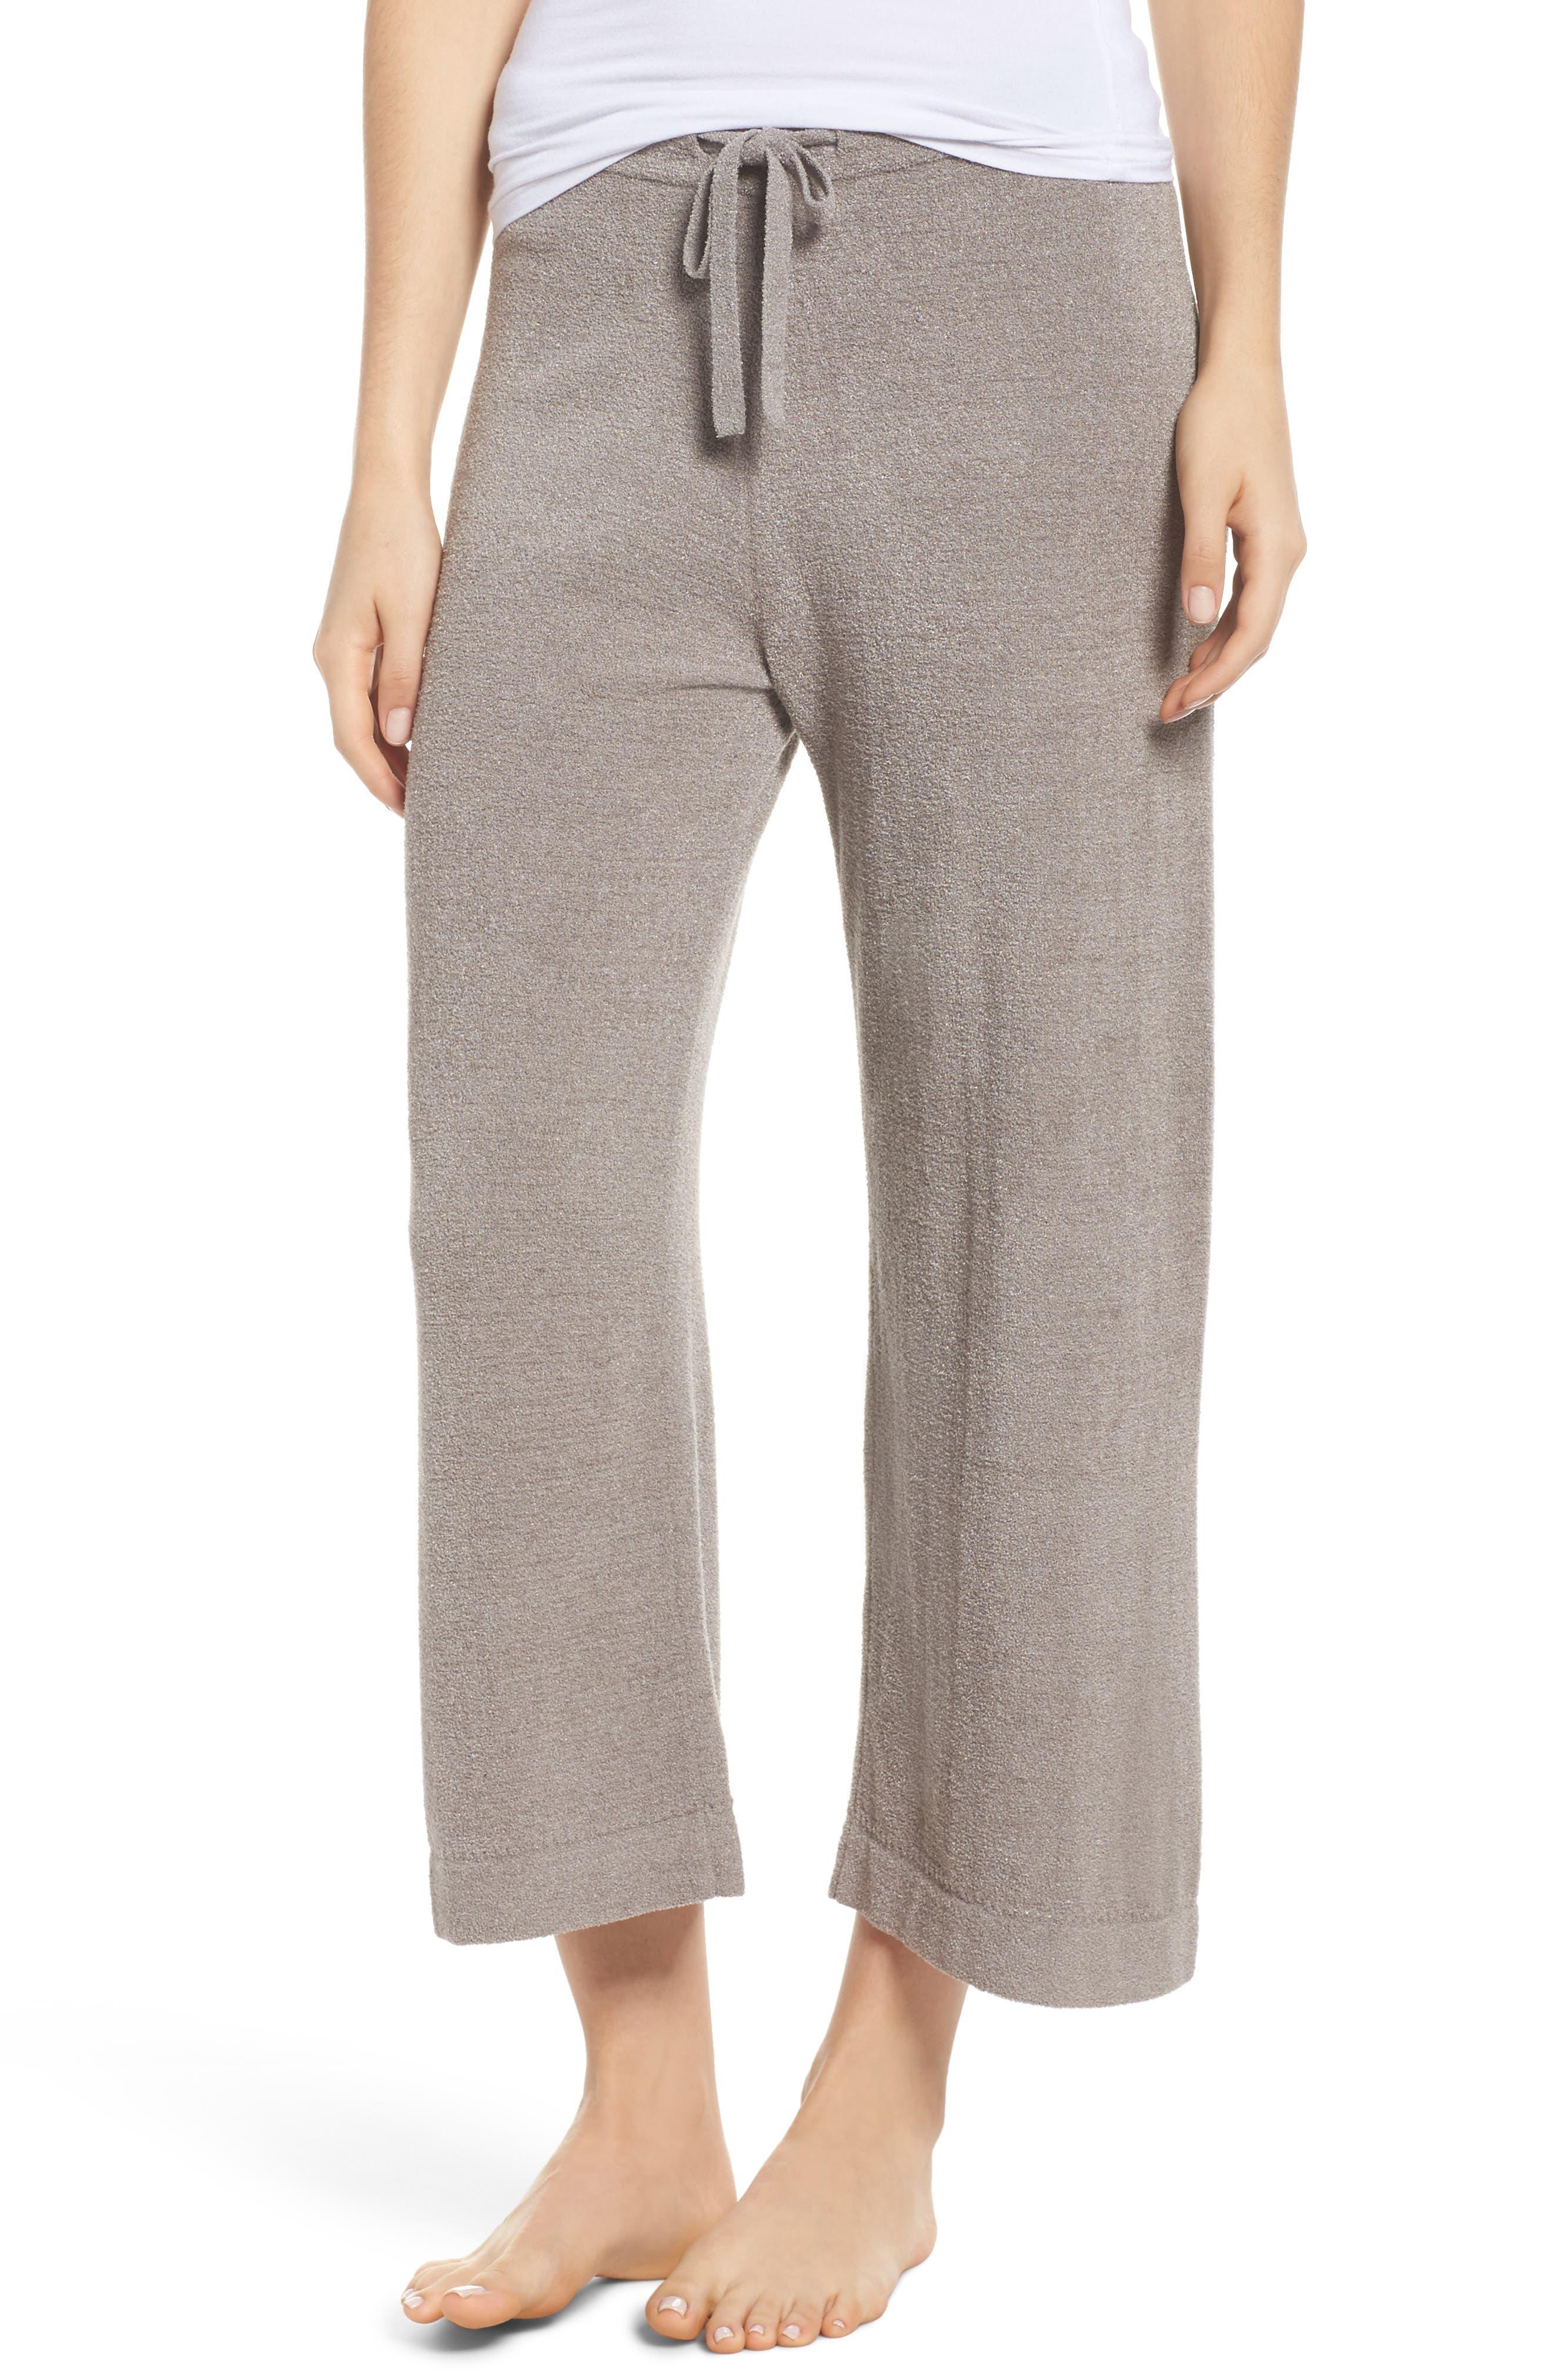 BAREFOOT DREAMS<SUP>®</SUP> Cozychic Ultra Lite<sup>®</sup> Culotte Lounge Pants, Main, color, 081